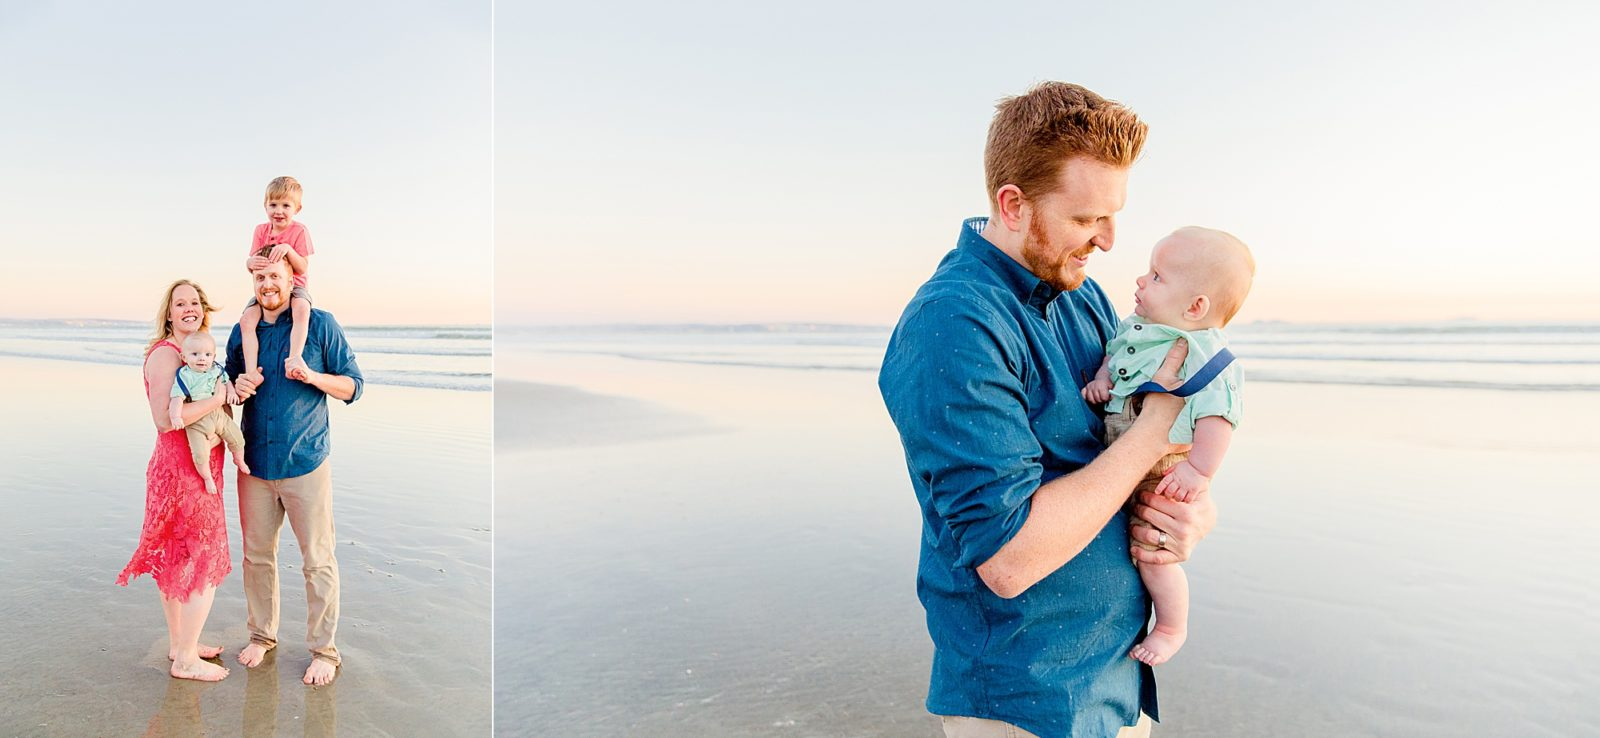 Family Photos San Diego | Amy Gray Photography